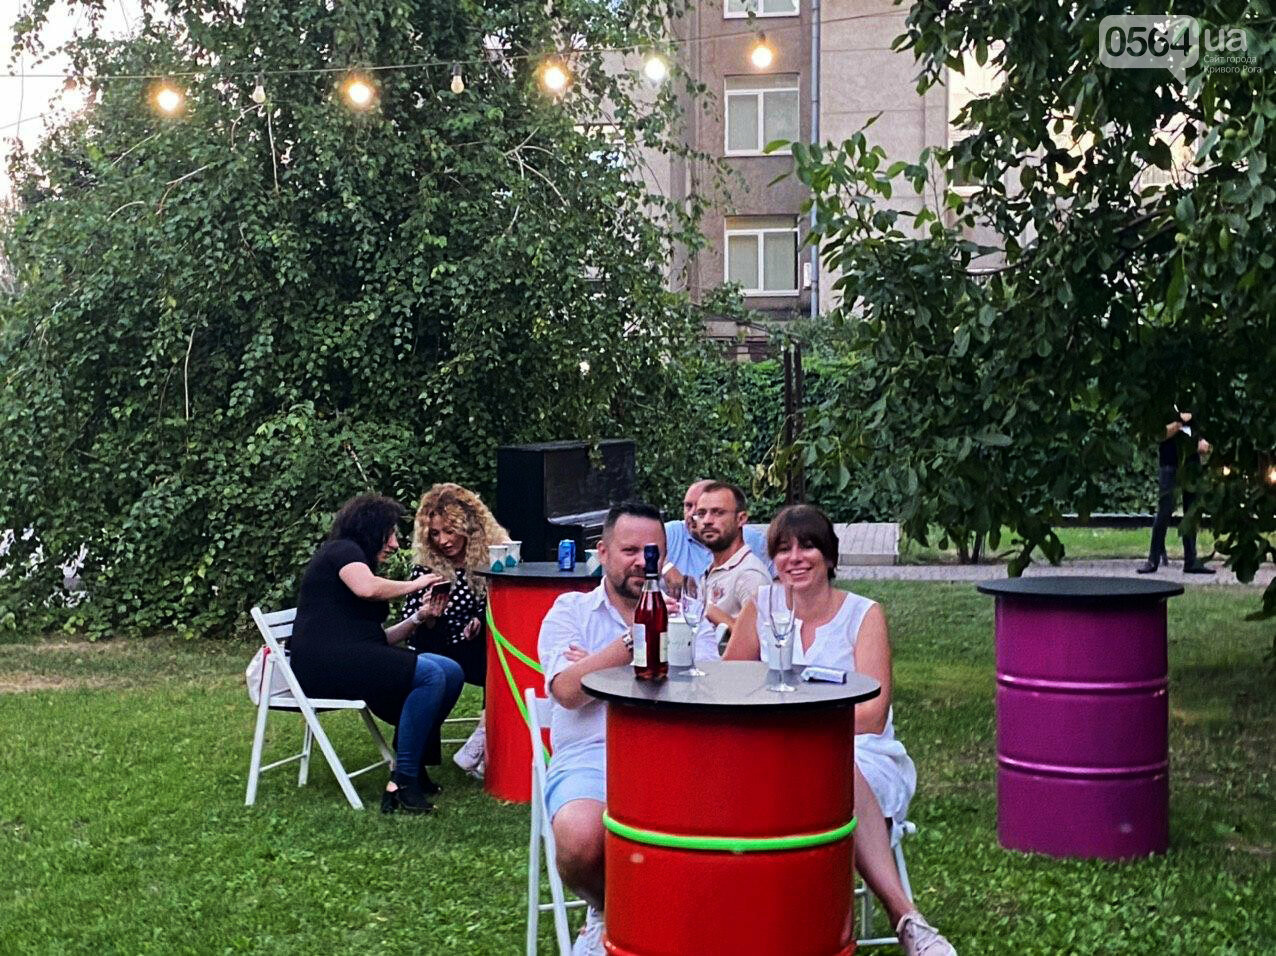 Под звездным небом криворожане наслаждались летним джазом от  Advantage Project, - ФОТО, ВИДЕО , фото-29